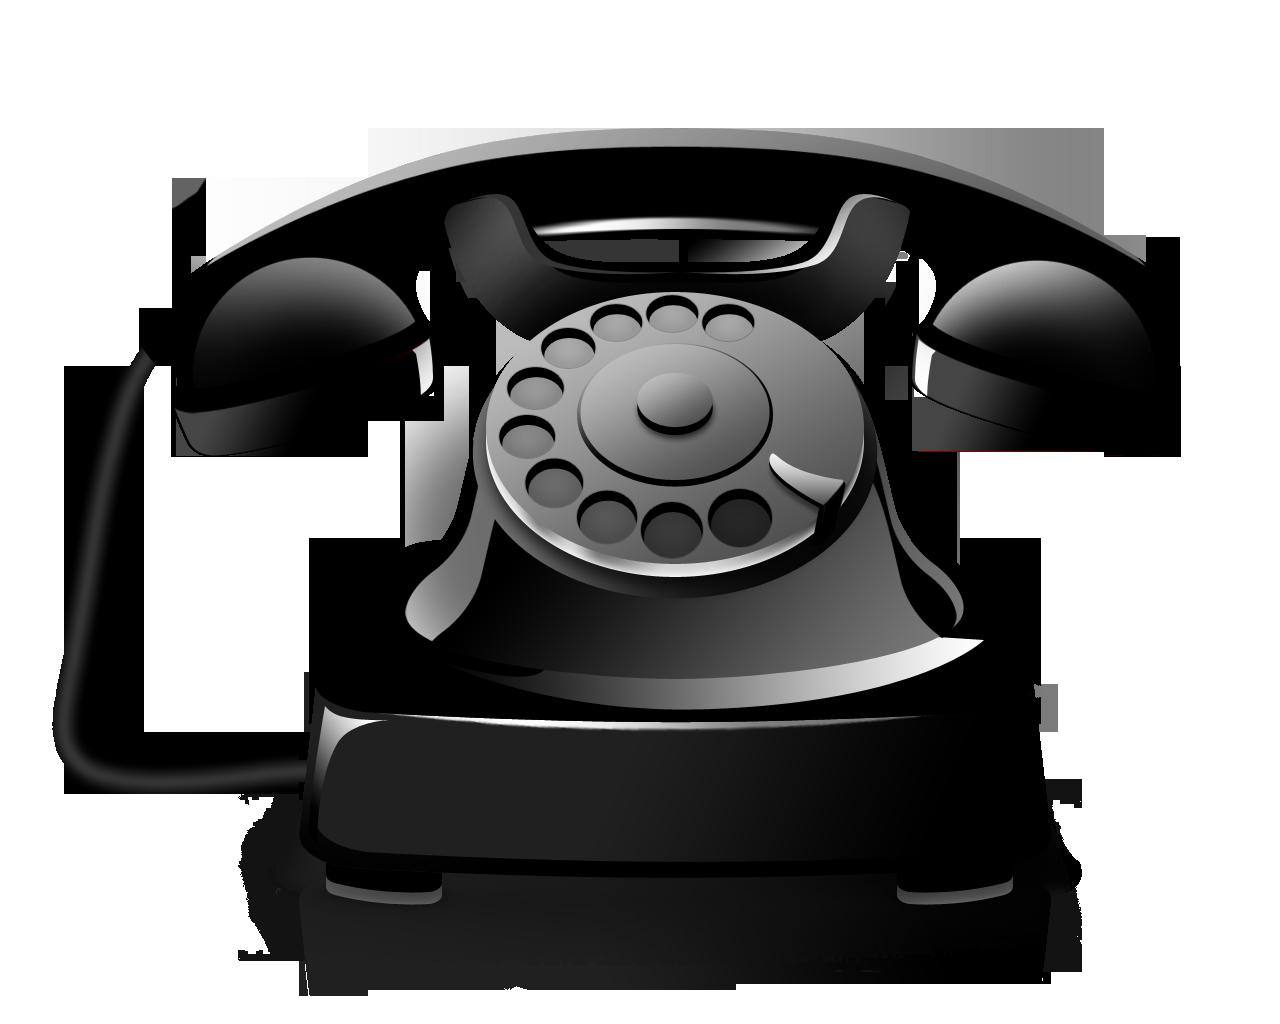 Phone Symbol Png - ClipArt Best